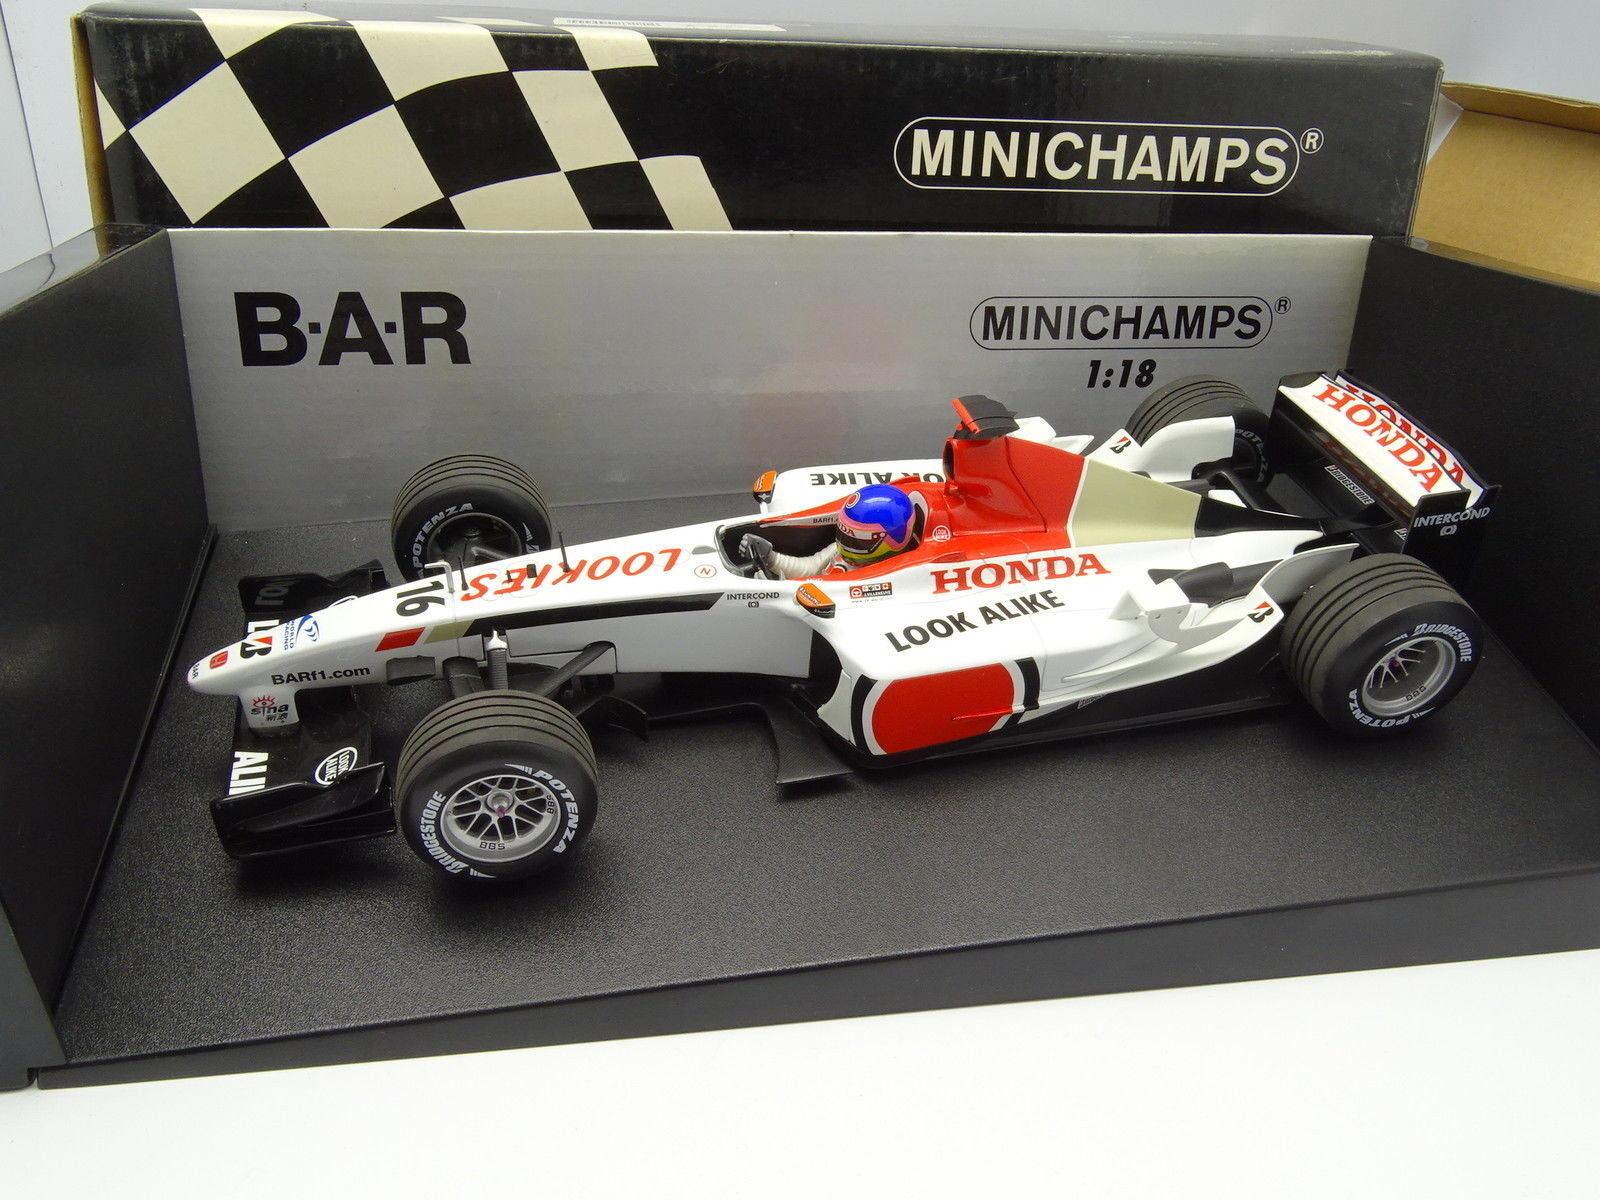 Minichamps 1 18 - F1 BAR Honda 005 Villeneuve